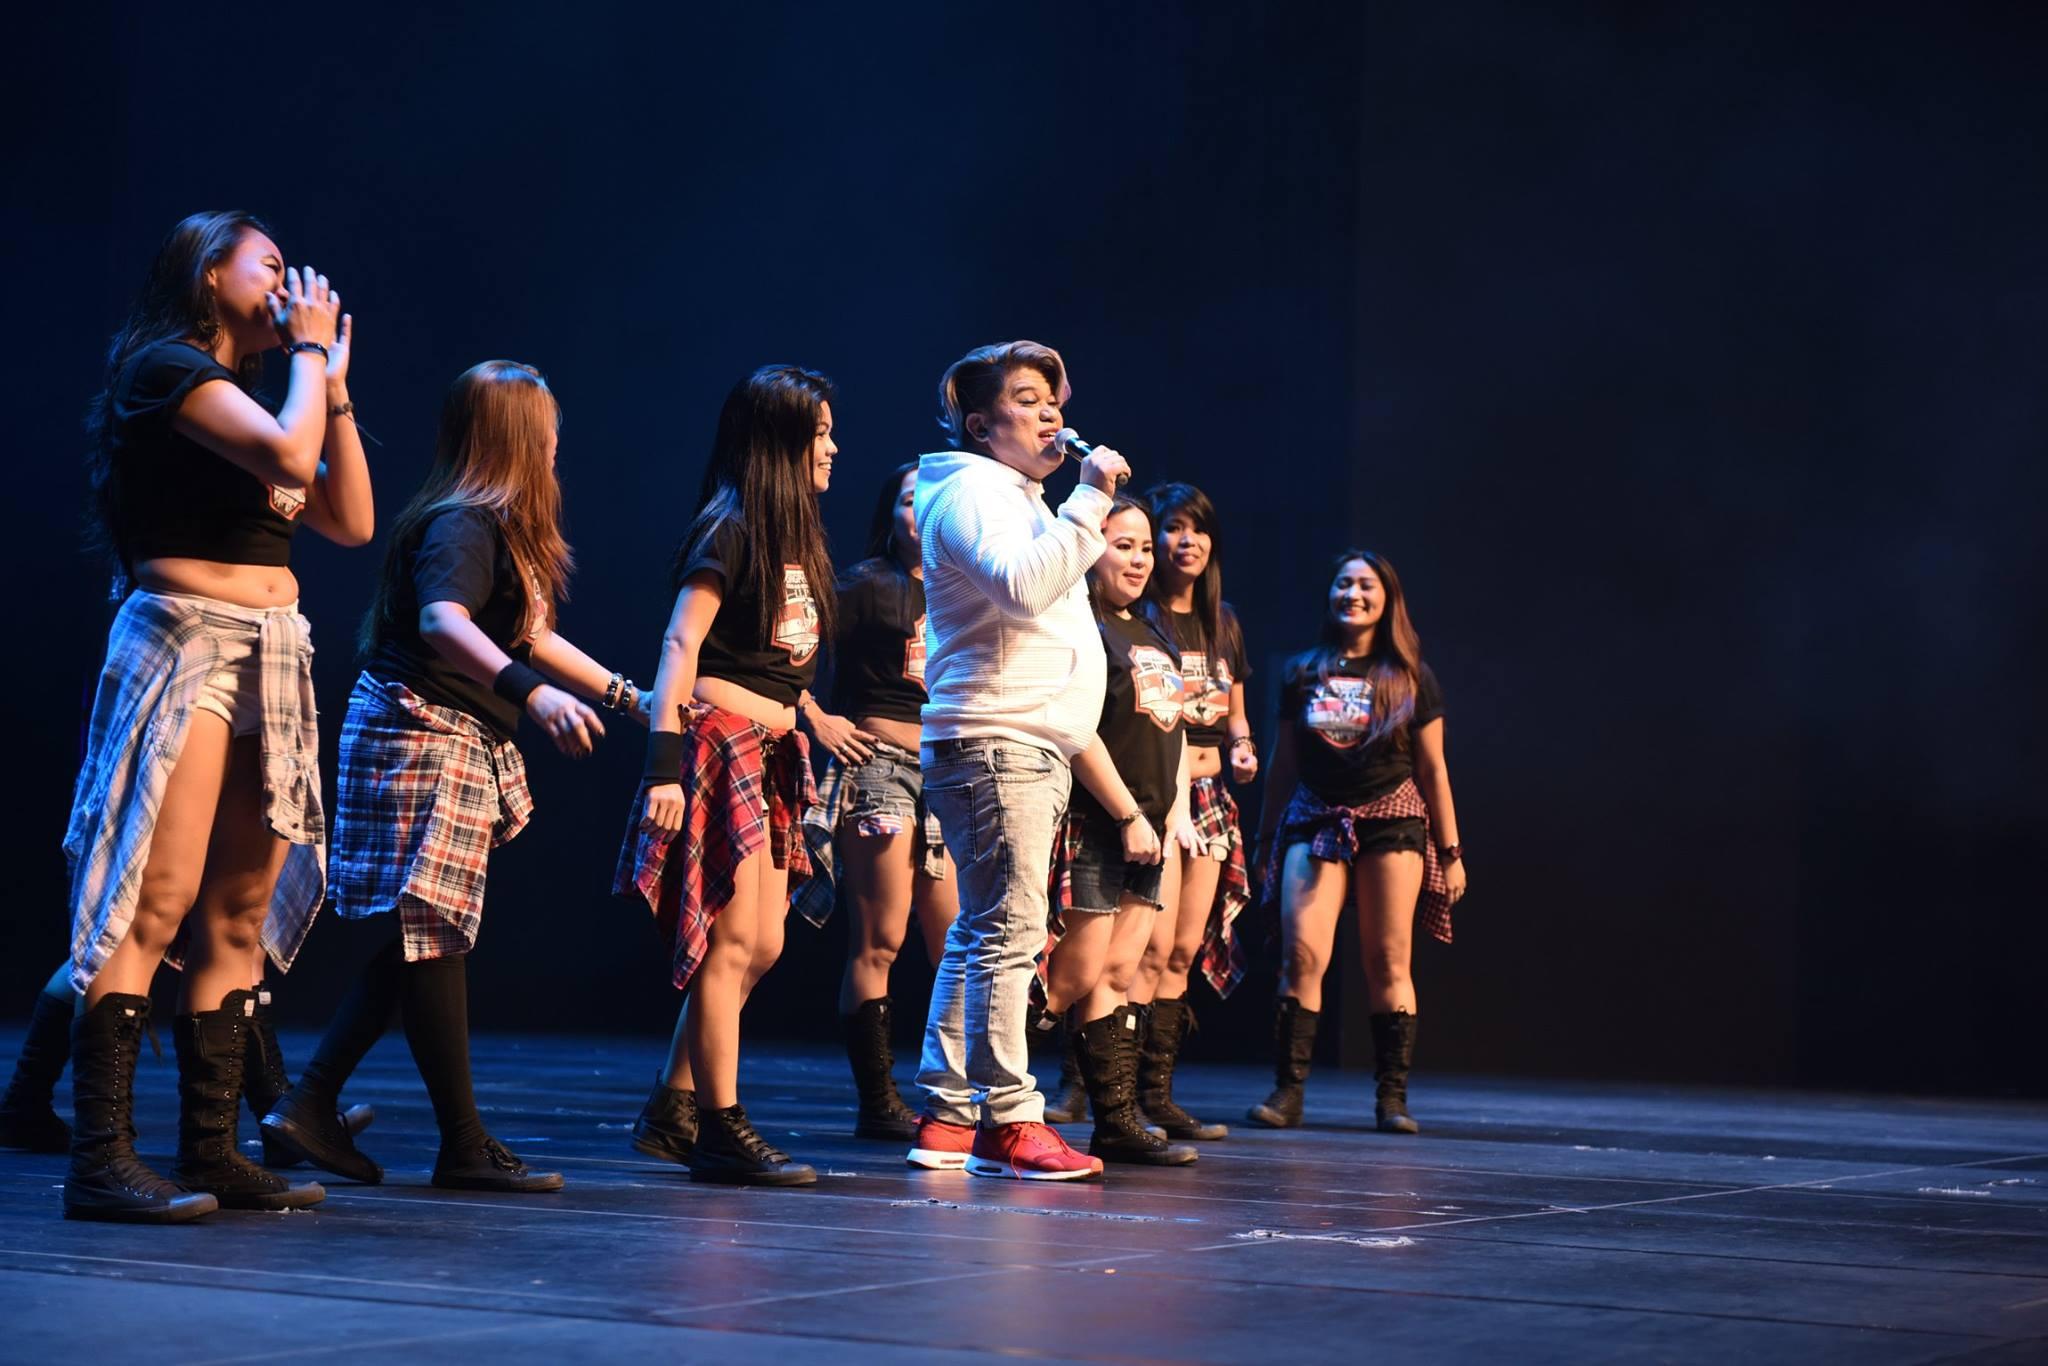 kim idol alden richards concert in singapore